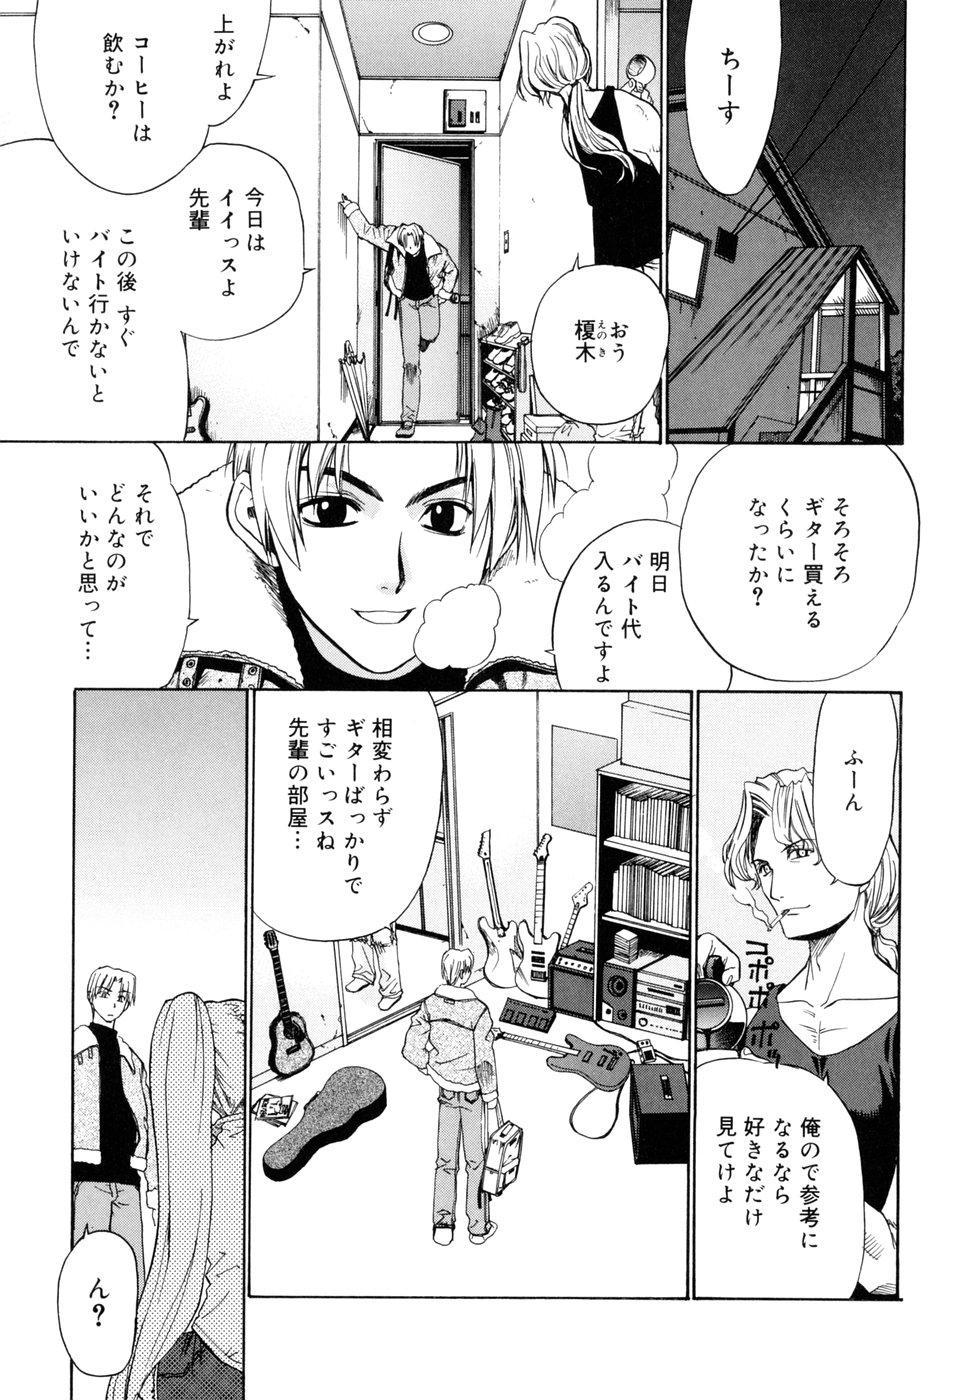 [Yaya Hinata] Tonari no Miko-san wa Minna Warau - The next shrine maidens smile in everyone. 182